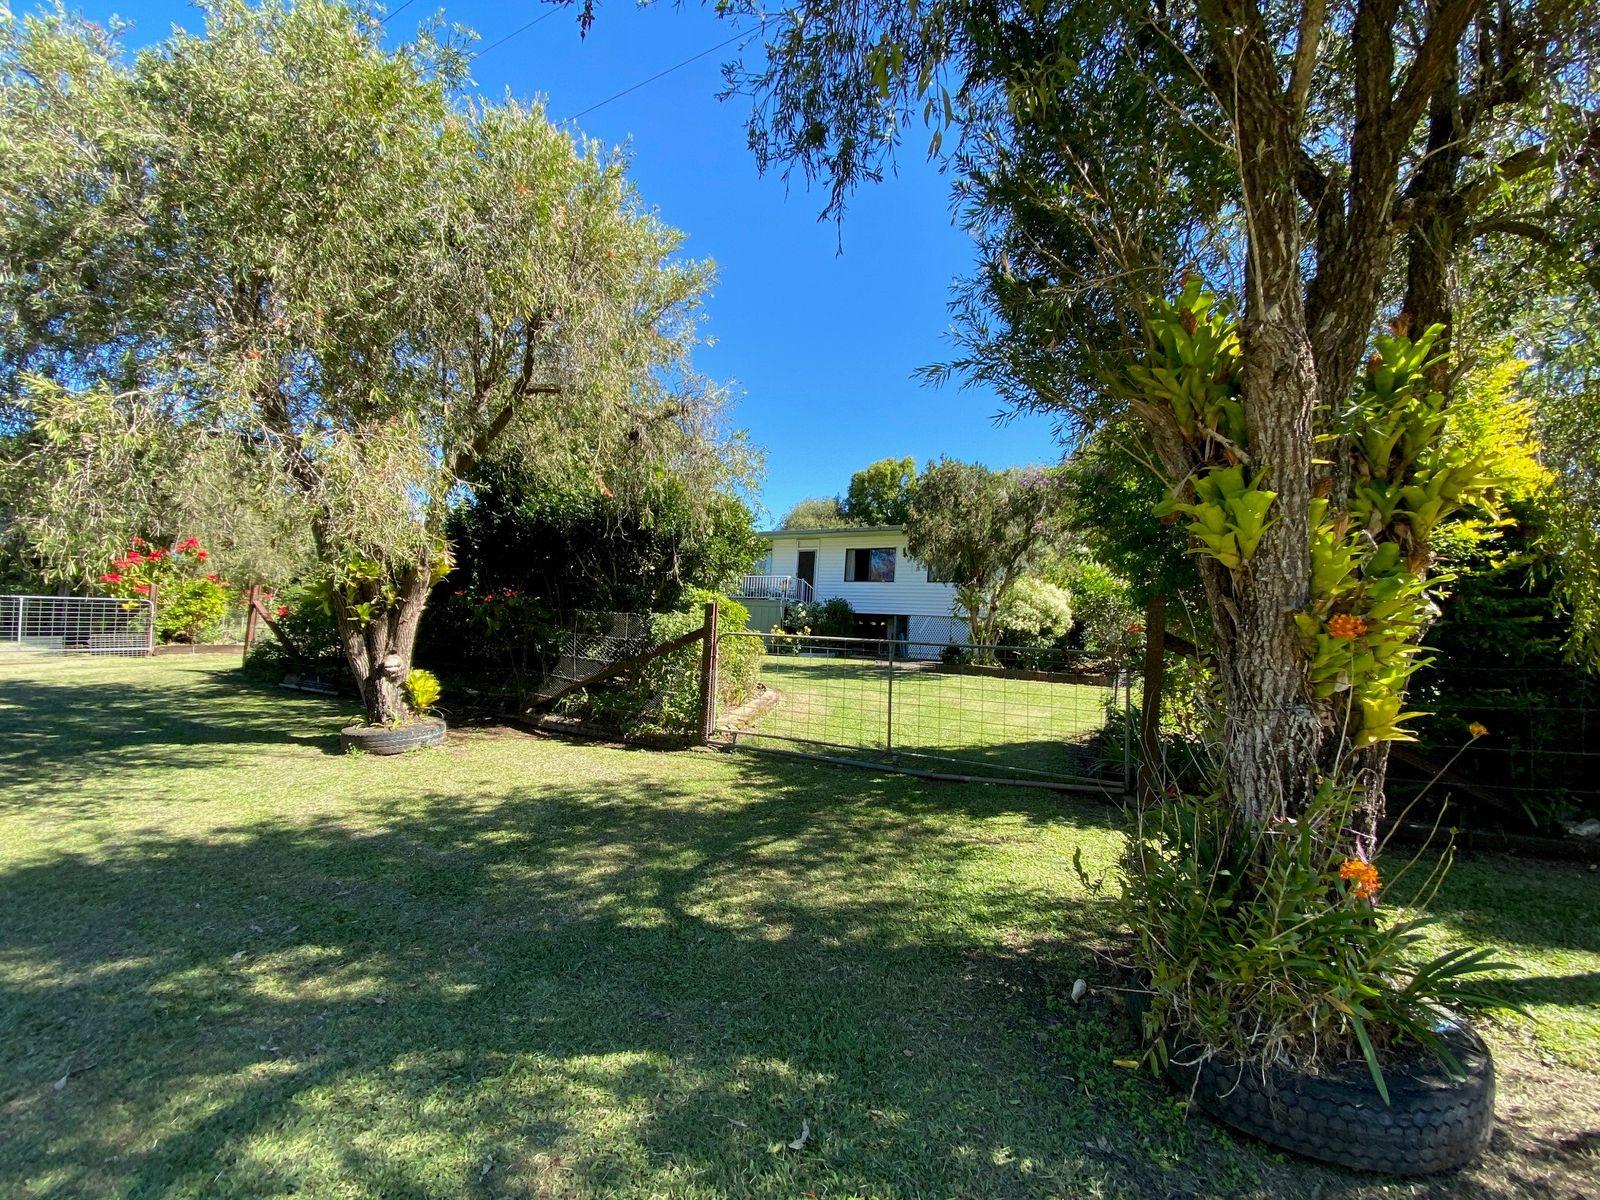 1980 Marlborough Sarina Road, Sarina Range, QLD 4737